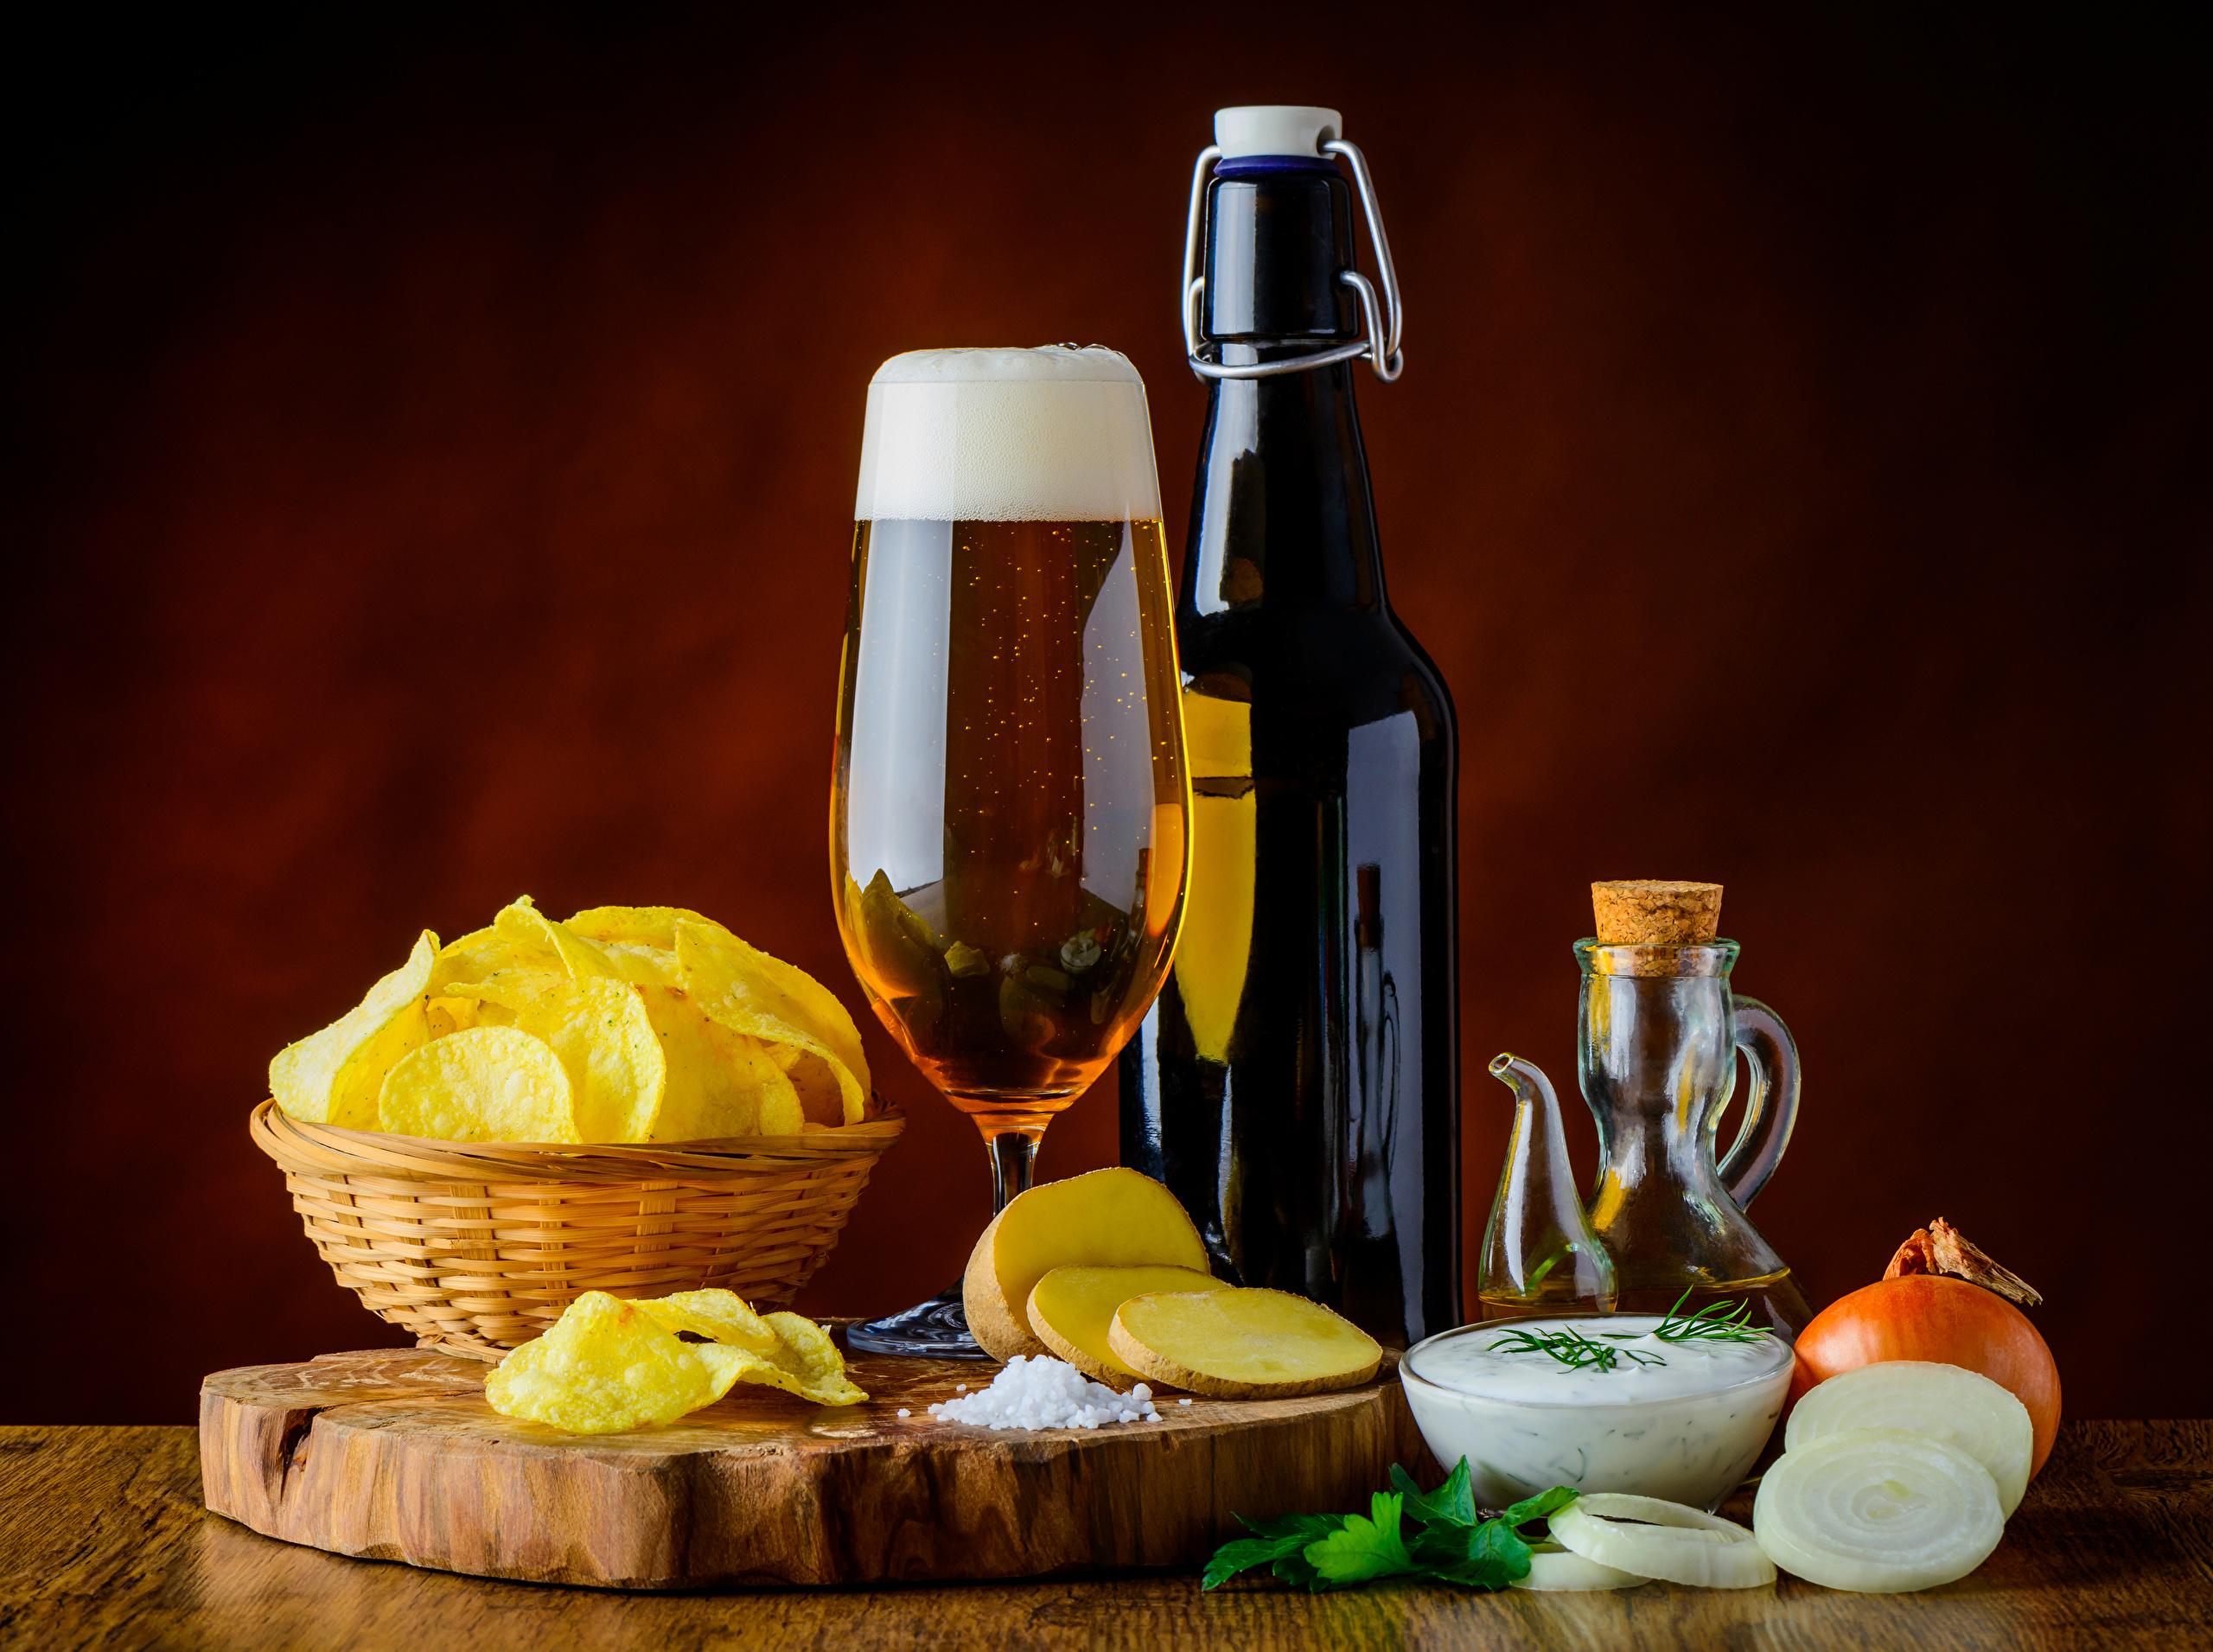 Images Beer Chips Onion Food Bottle Stemware 2560x1911